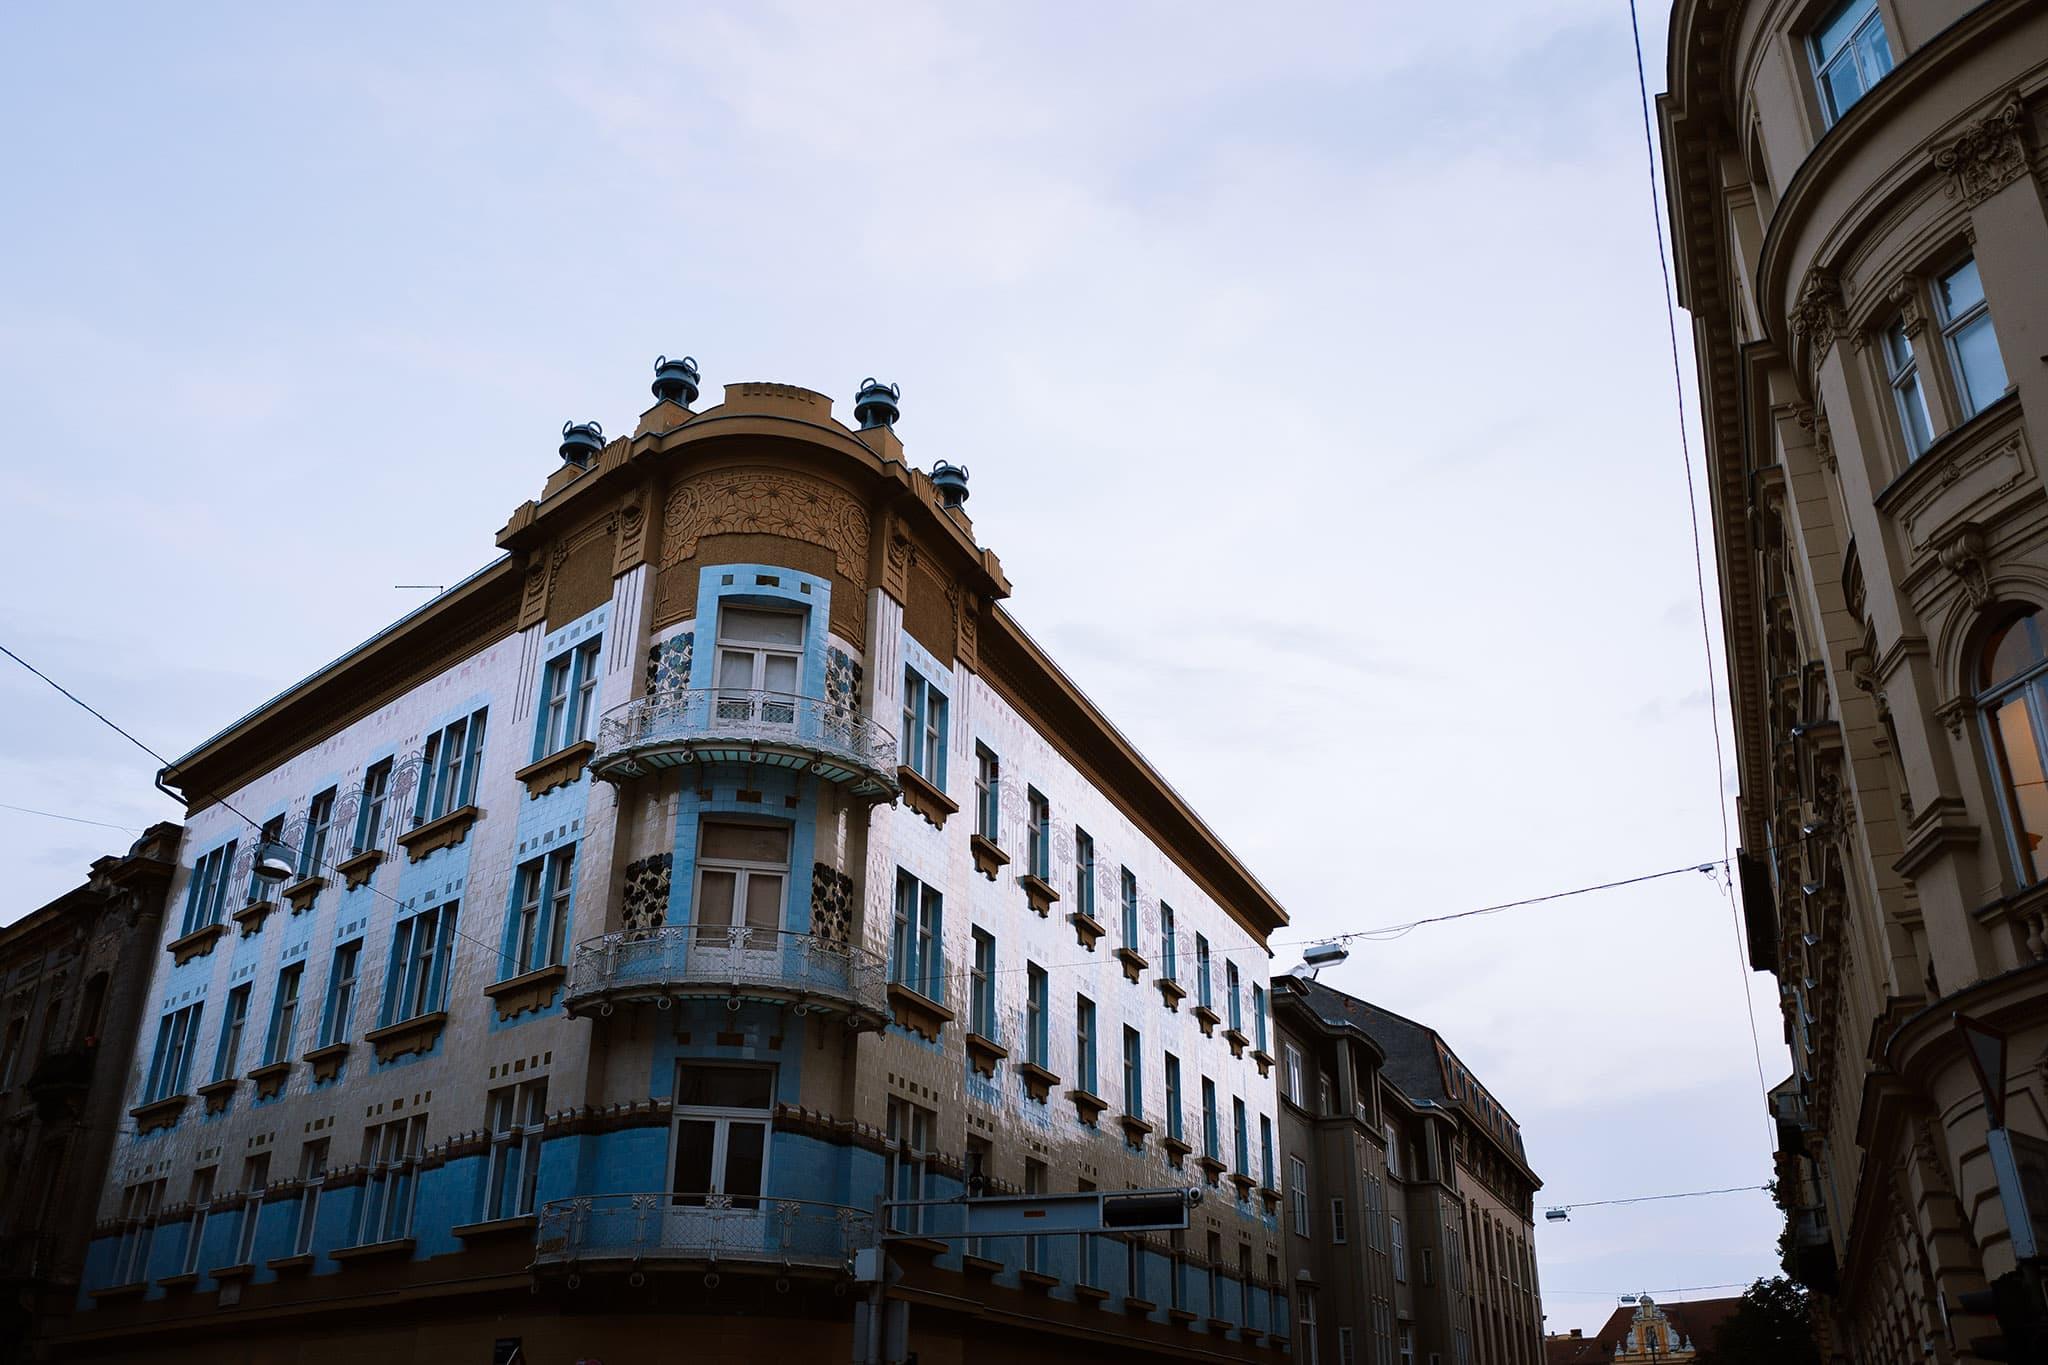 Zagrzeb i jego architektura